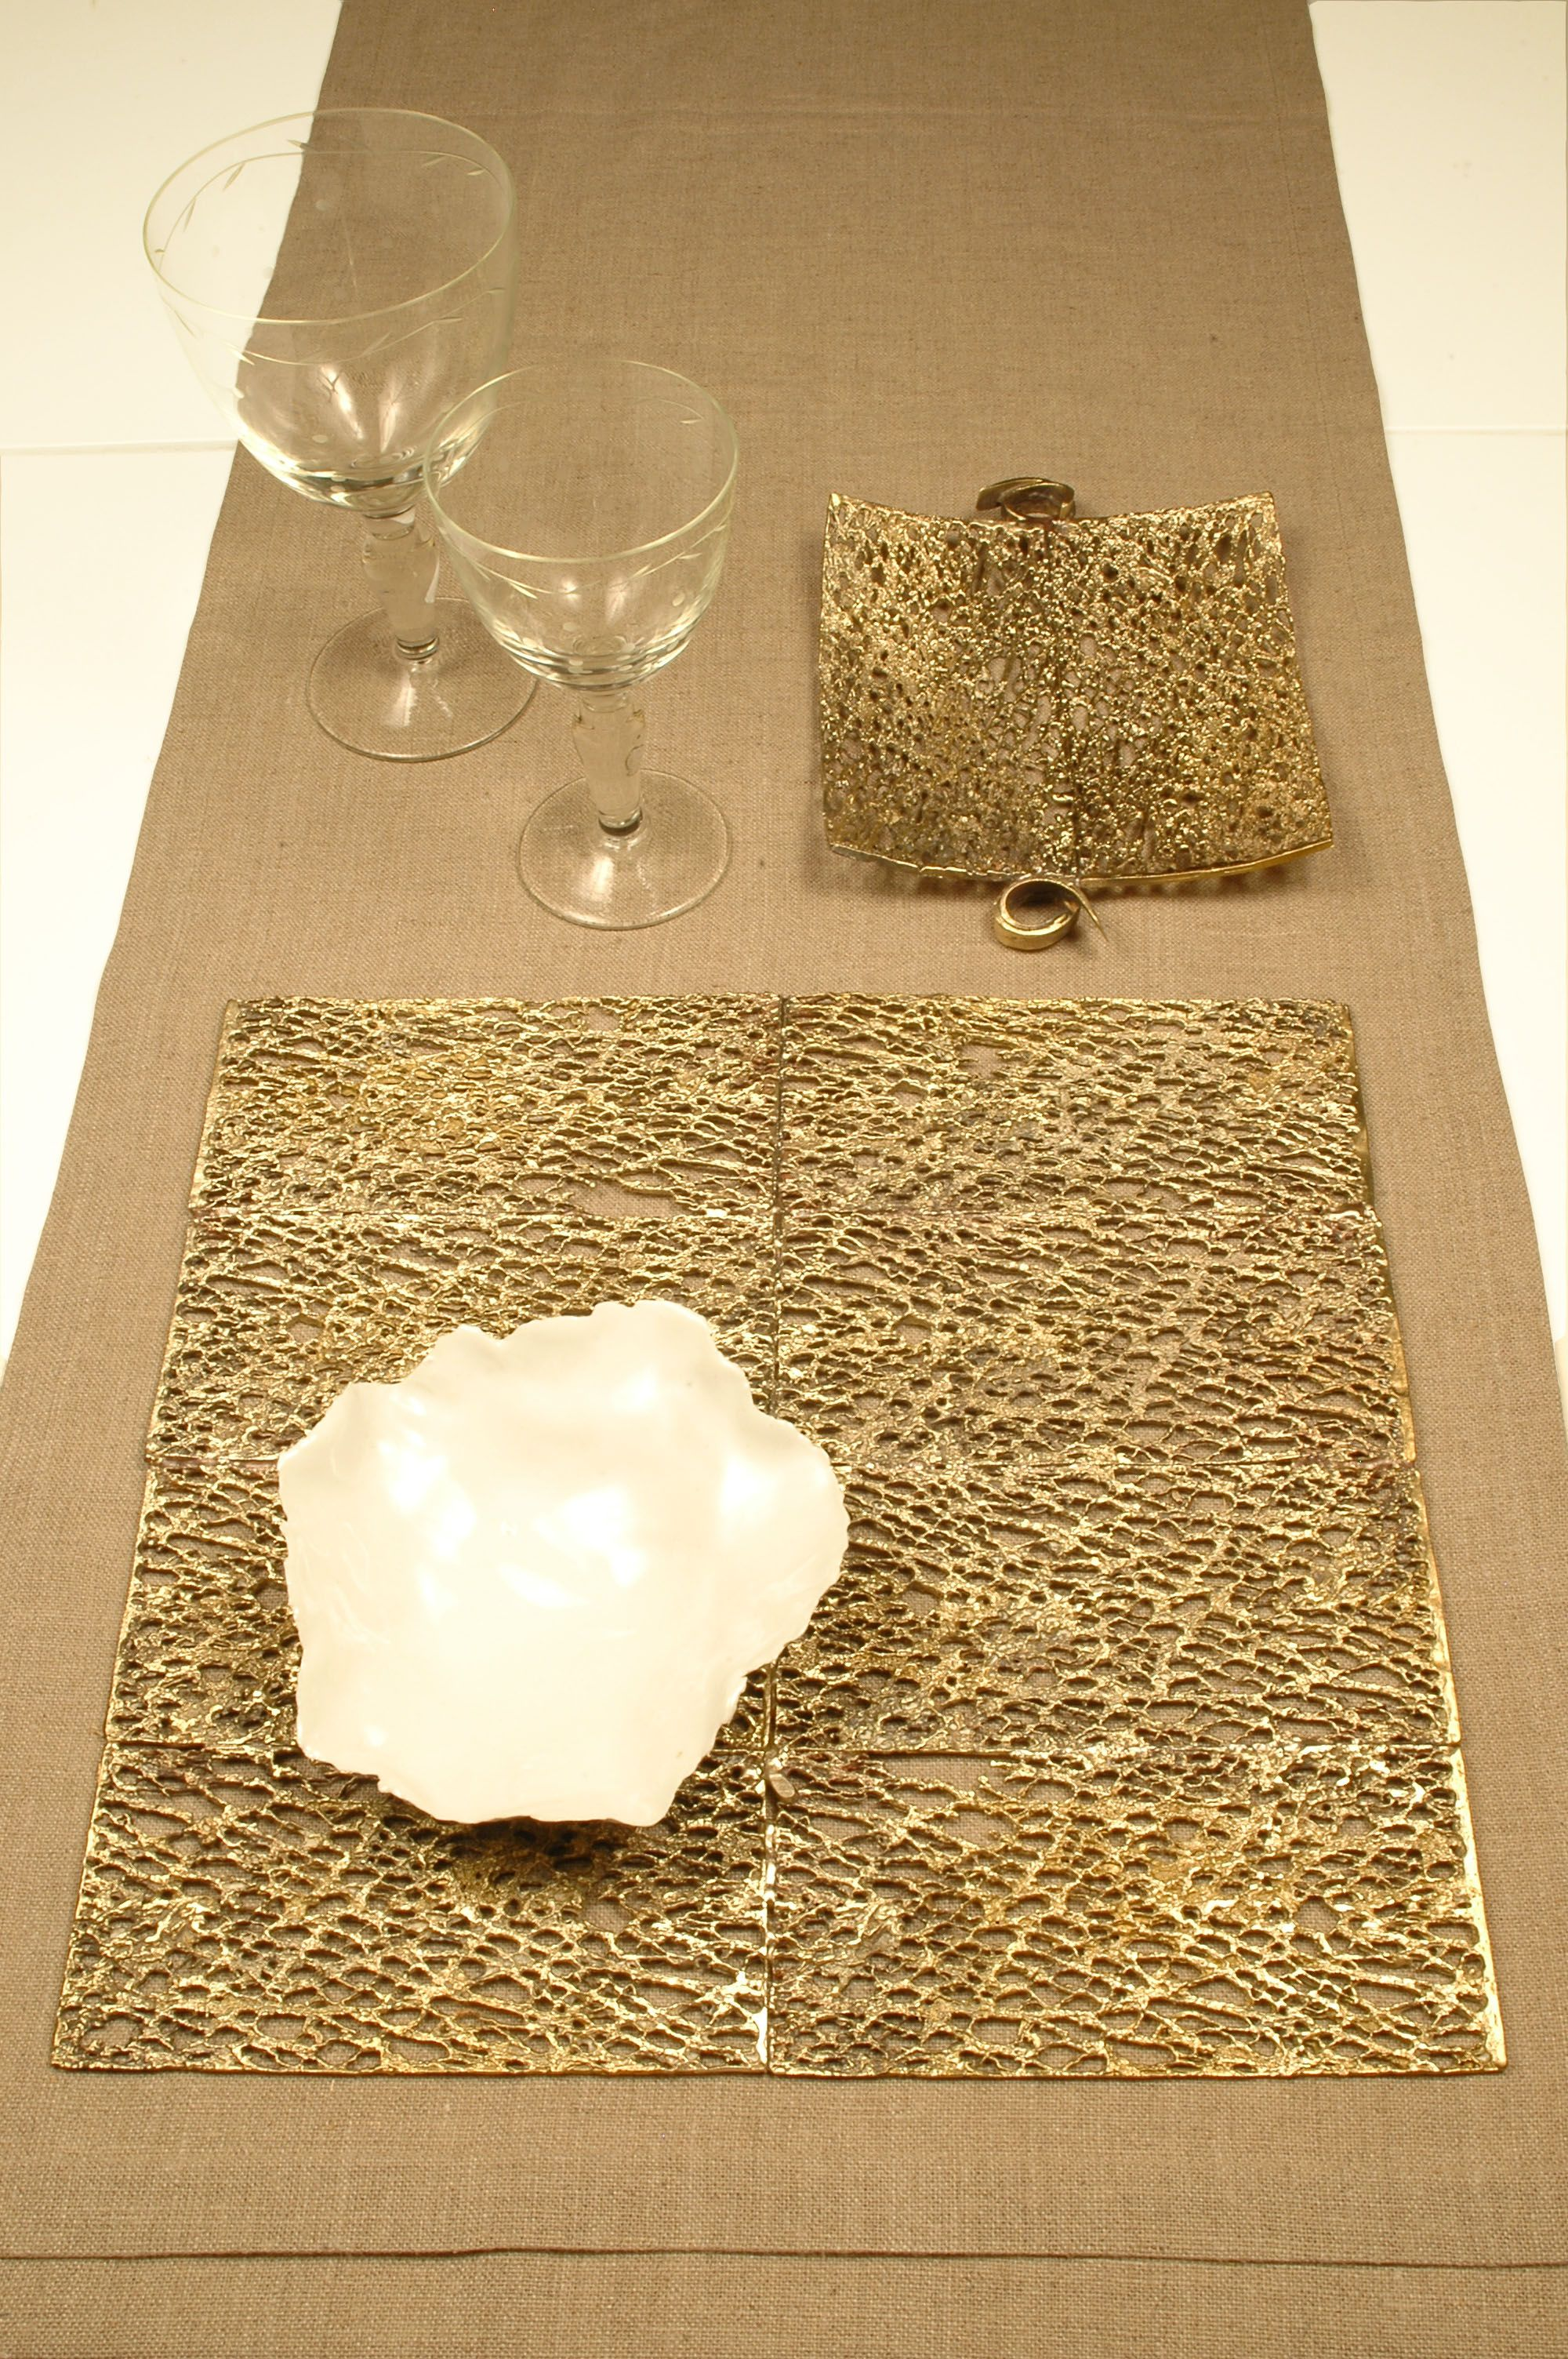 Sottopiatti / Placemats / Sets de table #tavola #table #deco ...